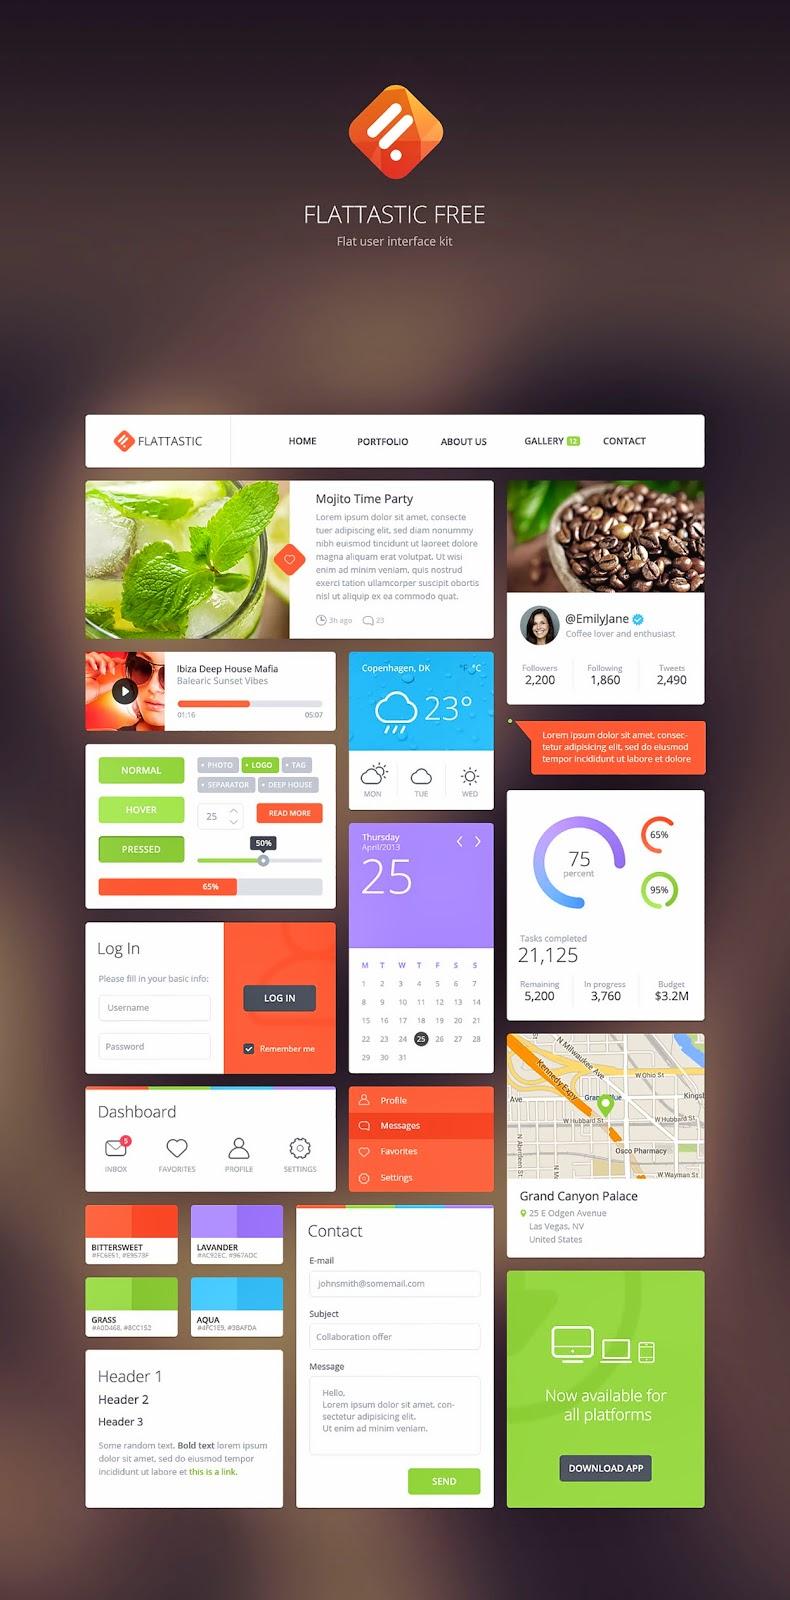 Free Flattastic UI Kit PSD